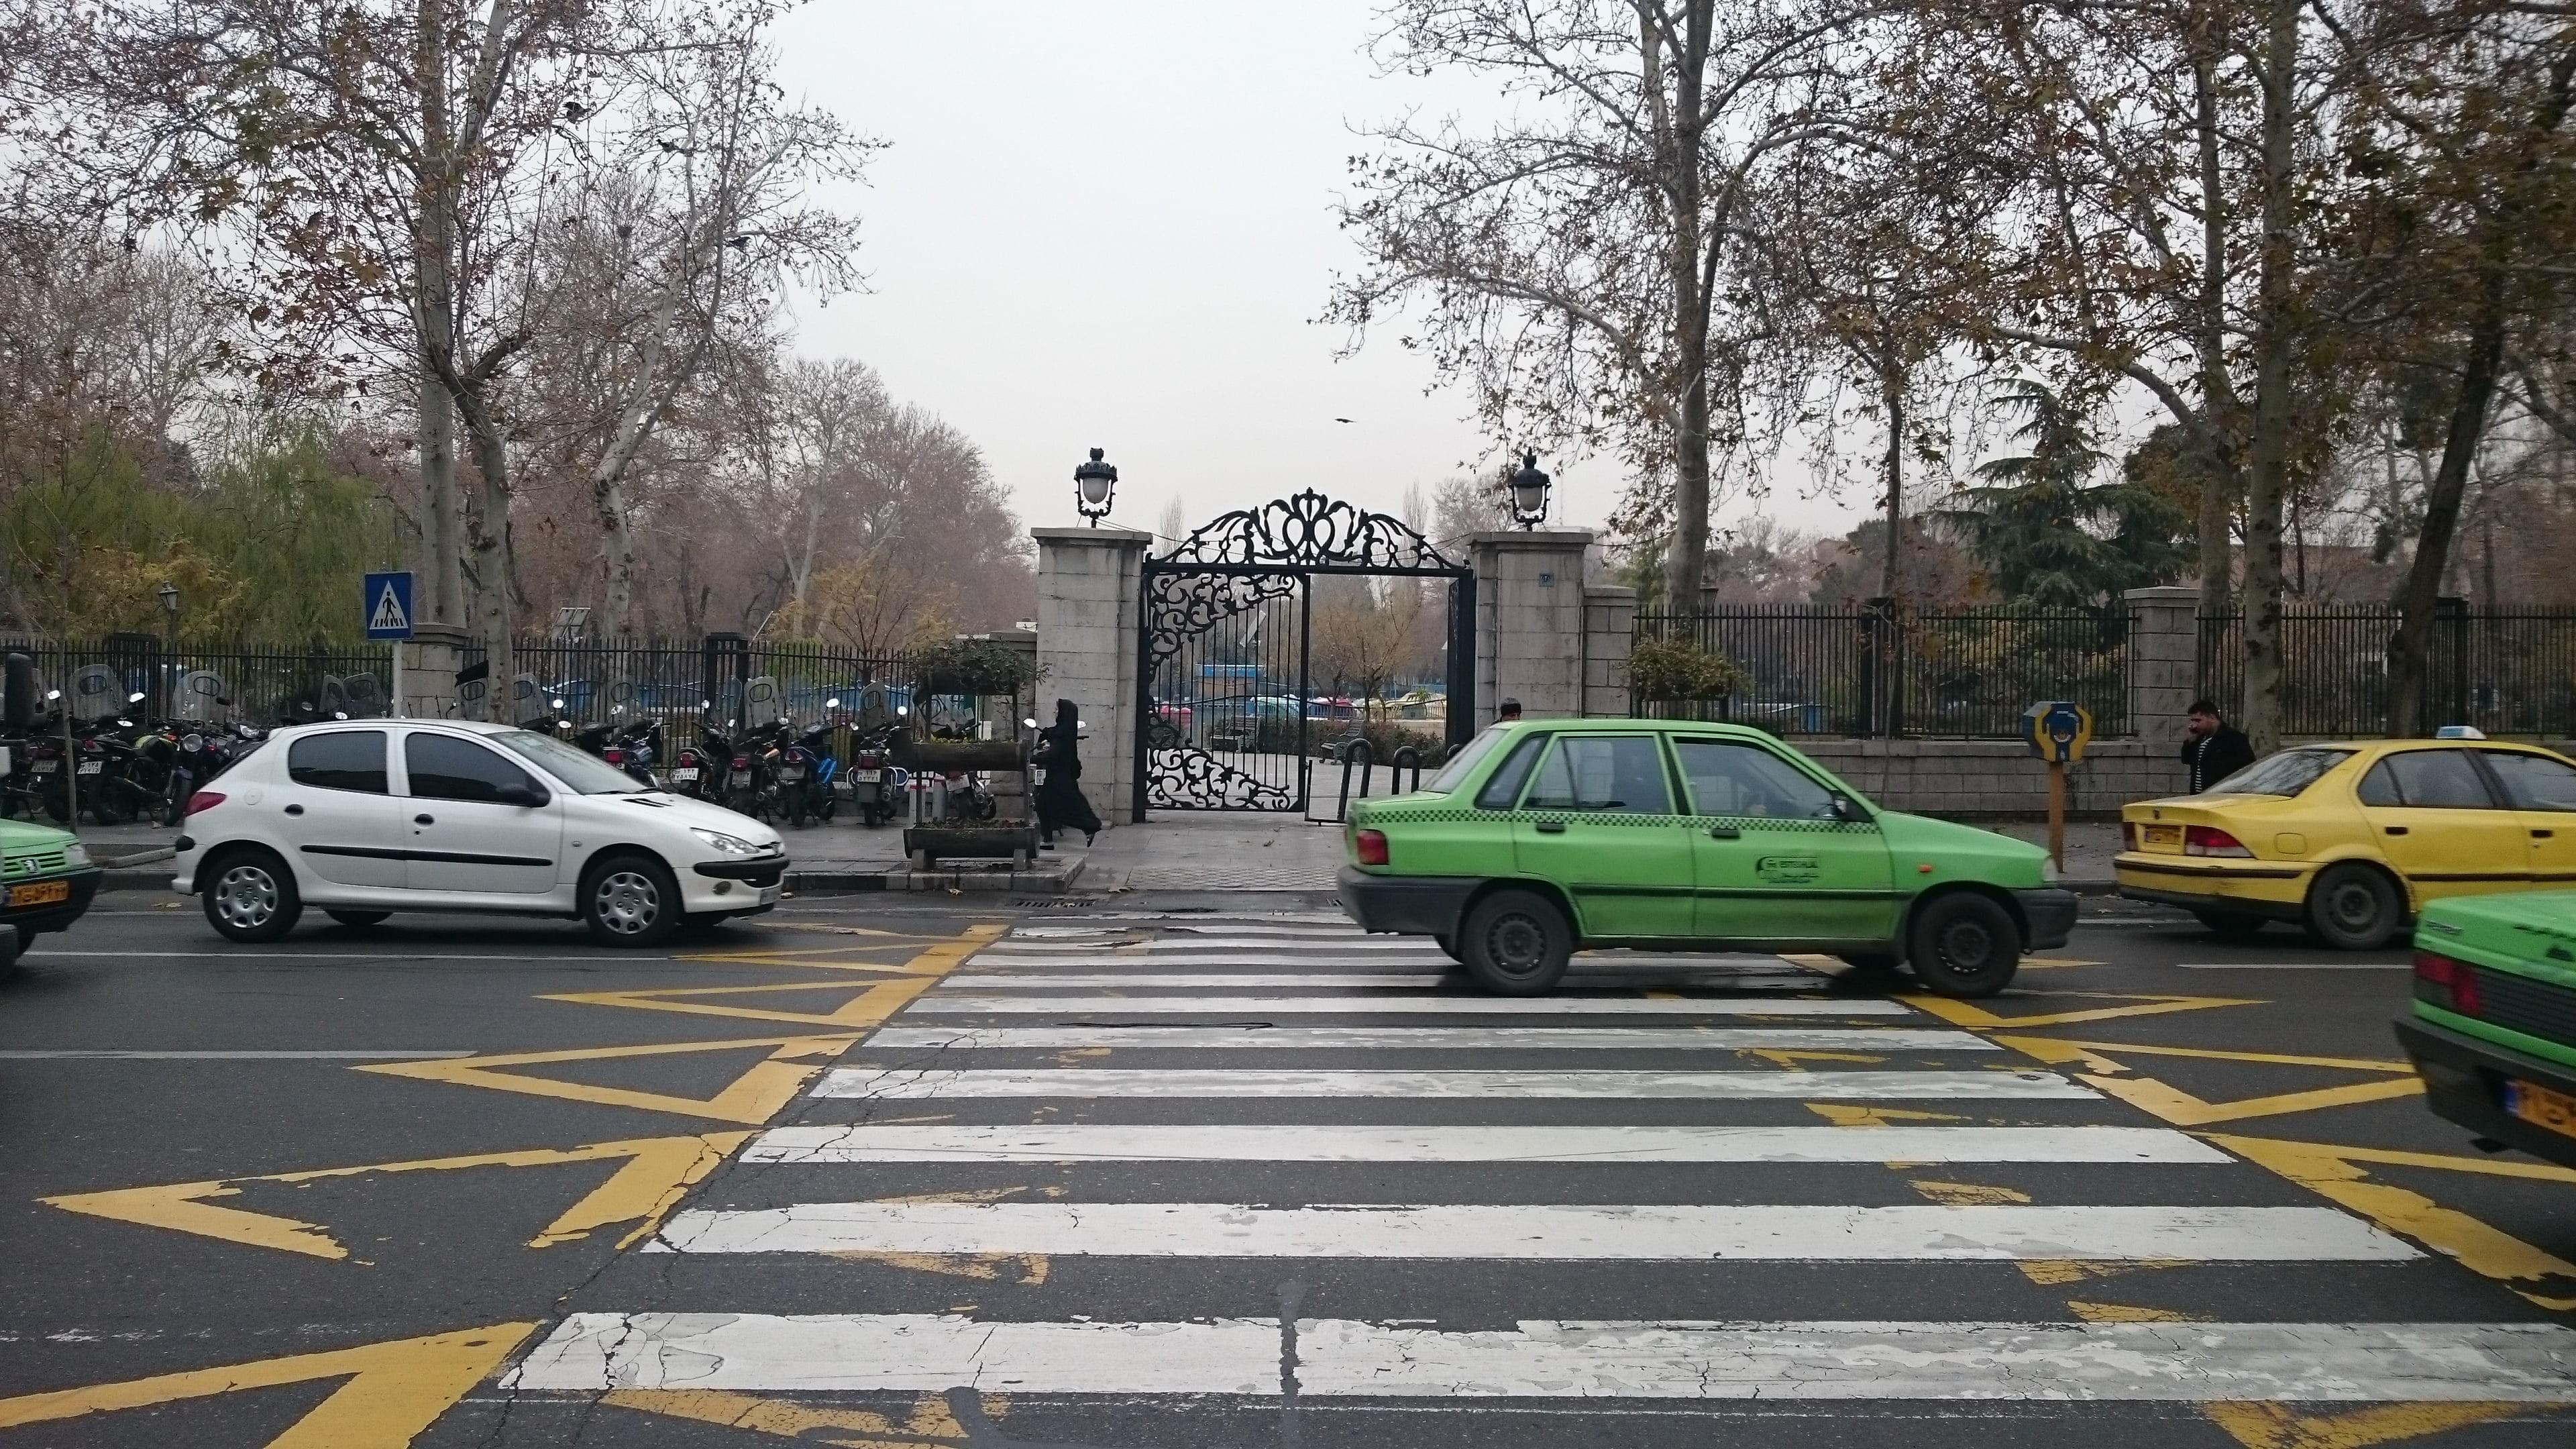 Getting a taxi in Tehran